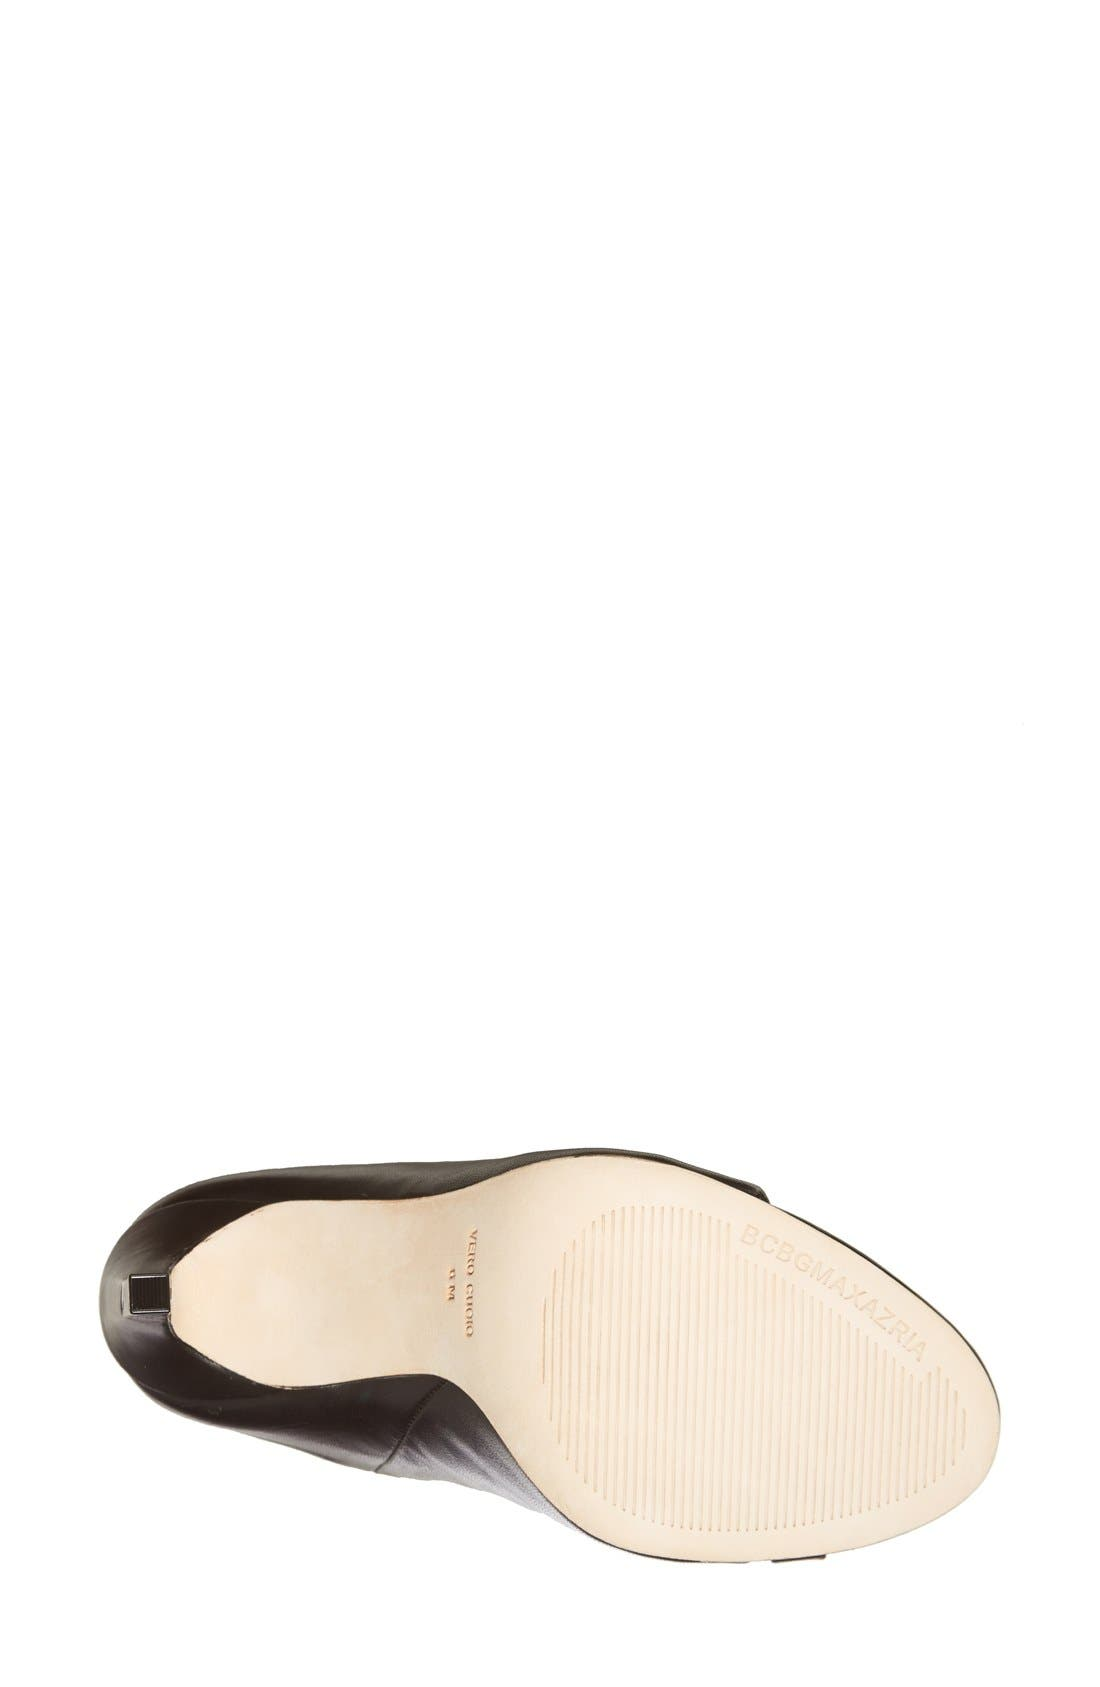 'Dag' Leather Sandal,                             Alternate thumbnail 2, color,                             001